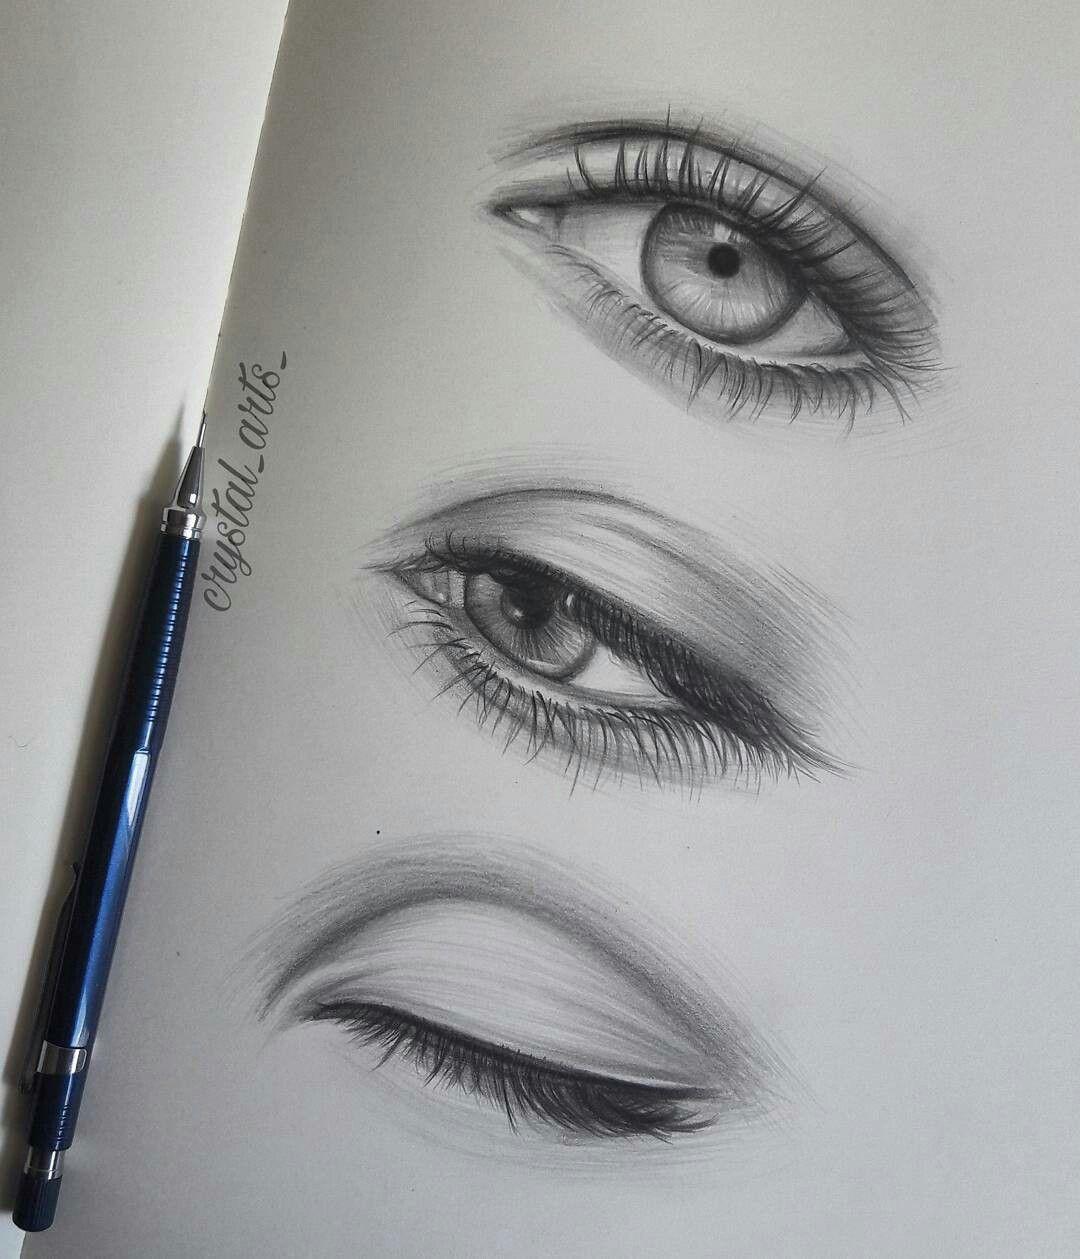 Pinterest Naomiokayyy Art Design Drawing Creative Artistic Painting Scrapbooking Journalling Journal Read Bo Realistic Drawings Eye Drawing Eye Art